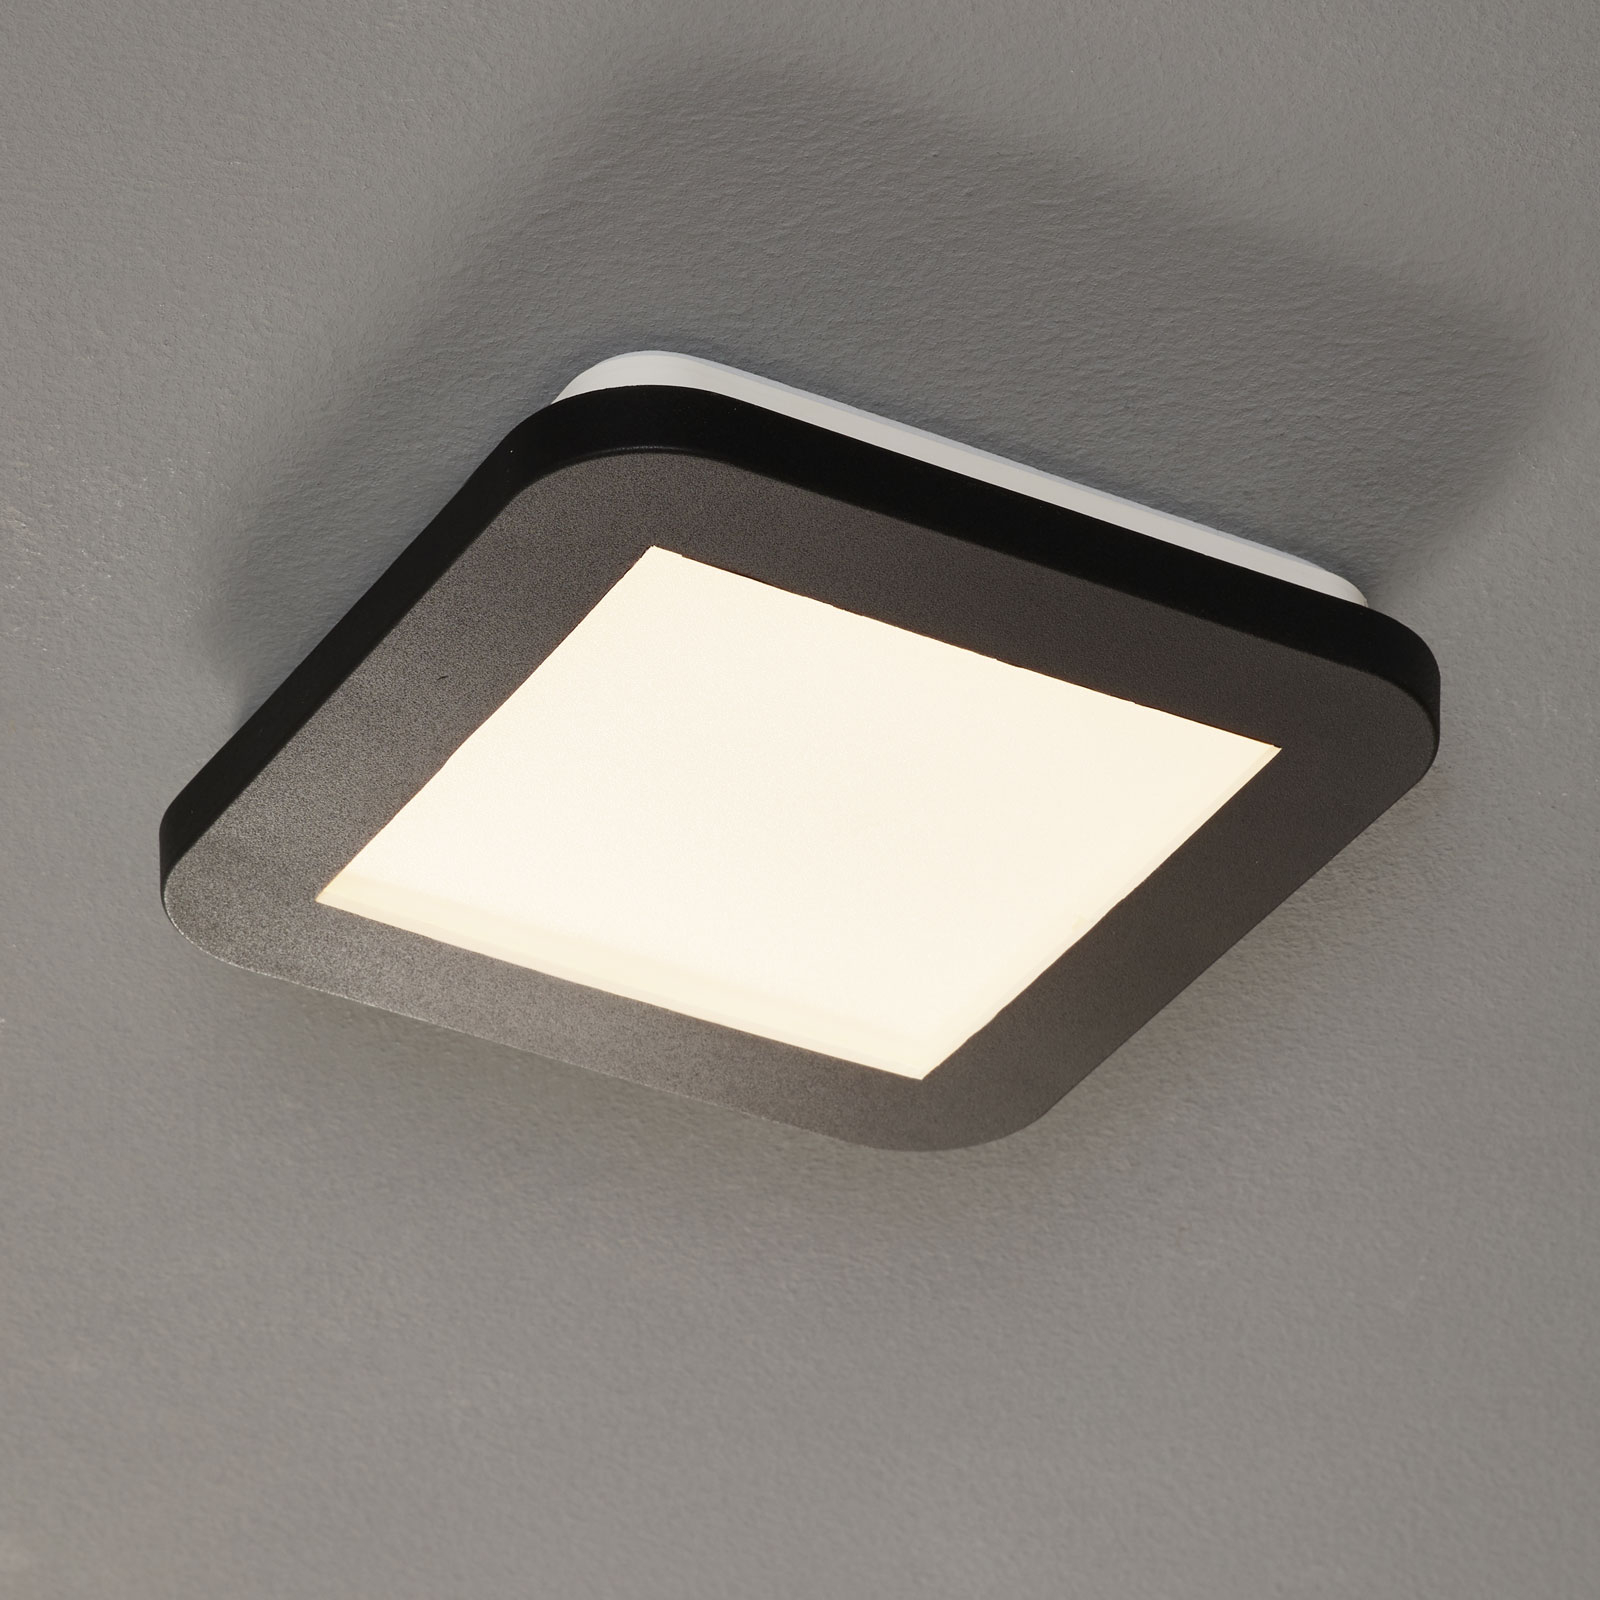 Lampa sufitowa LED Camillus, kwadratowa, 17 cm